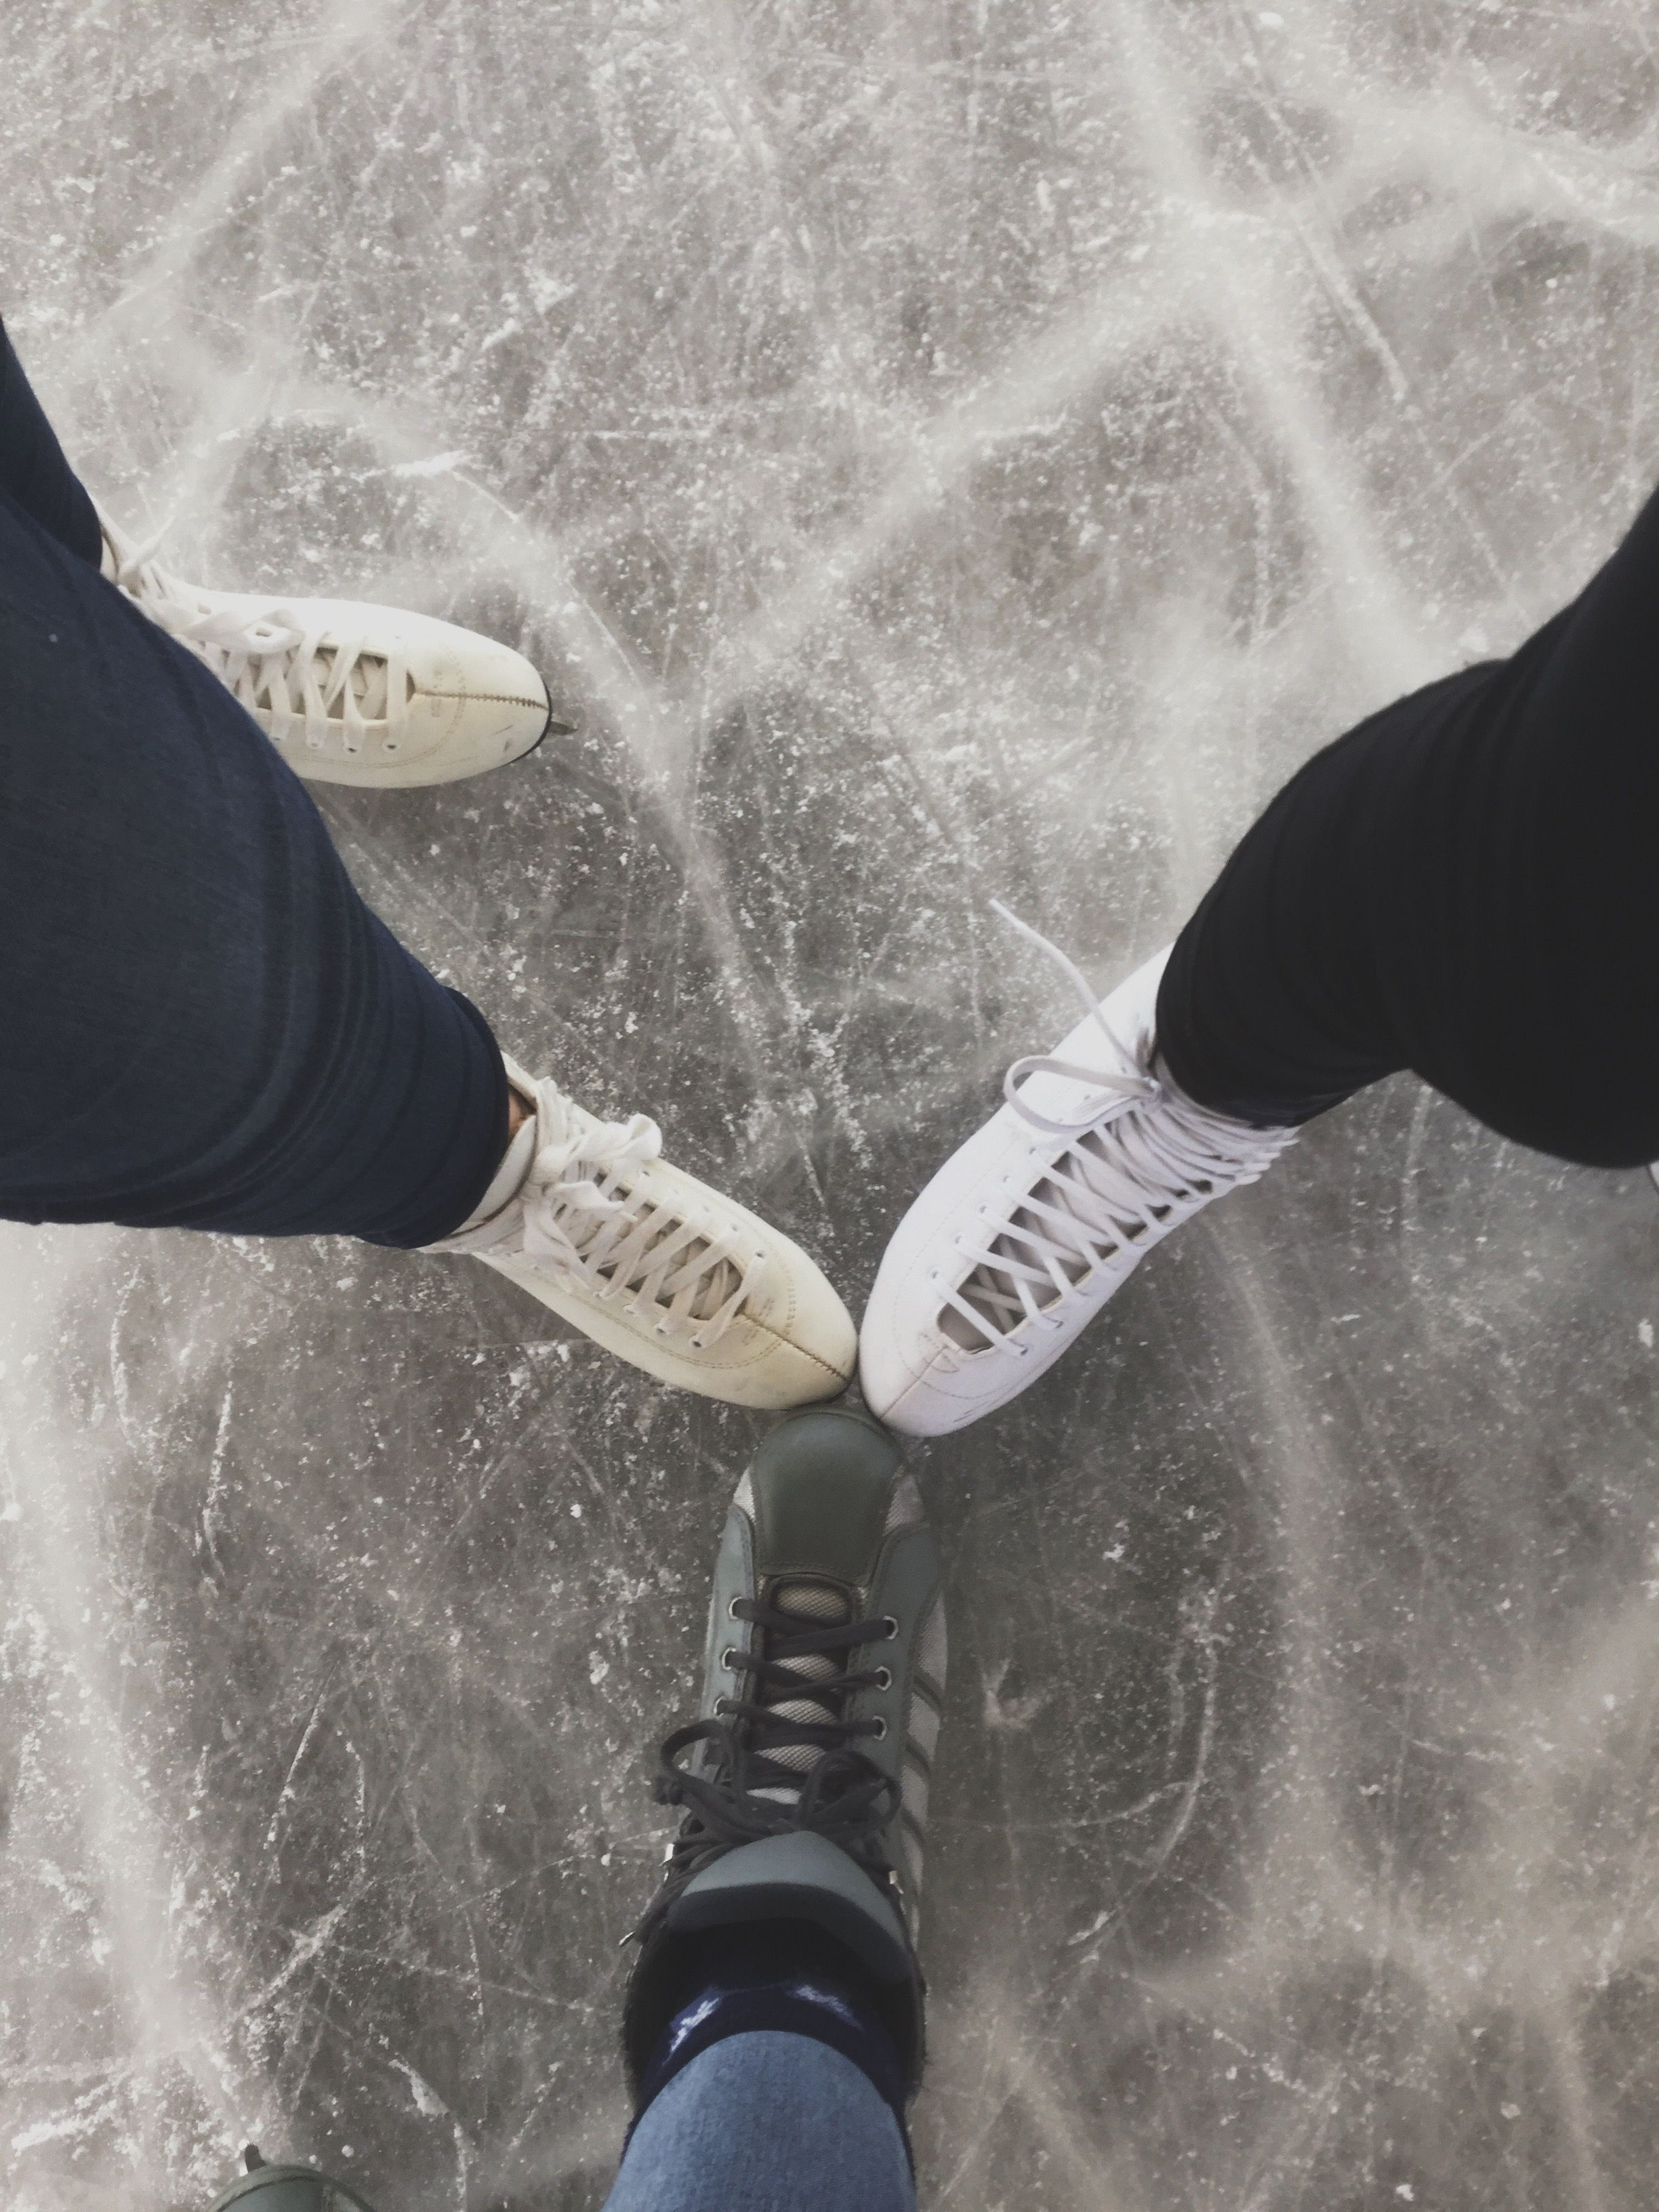 Ice Skating Aesthetic Ice Skating Skate Ice Aesthetic